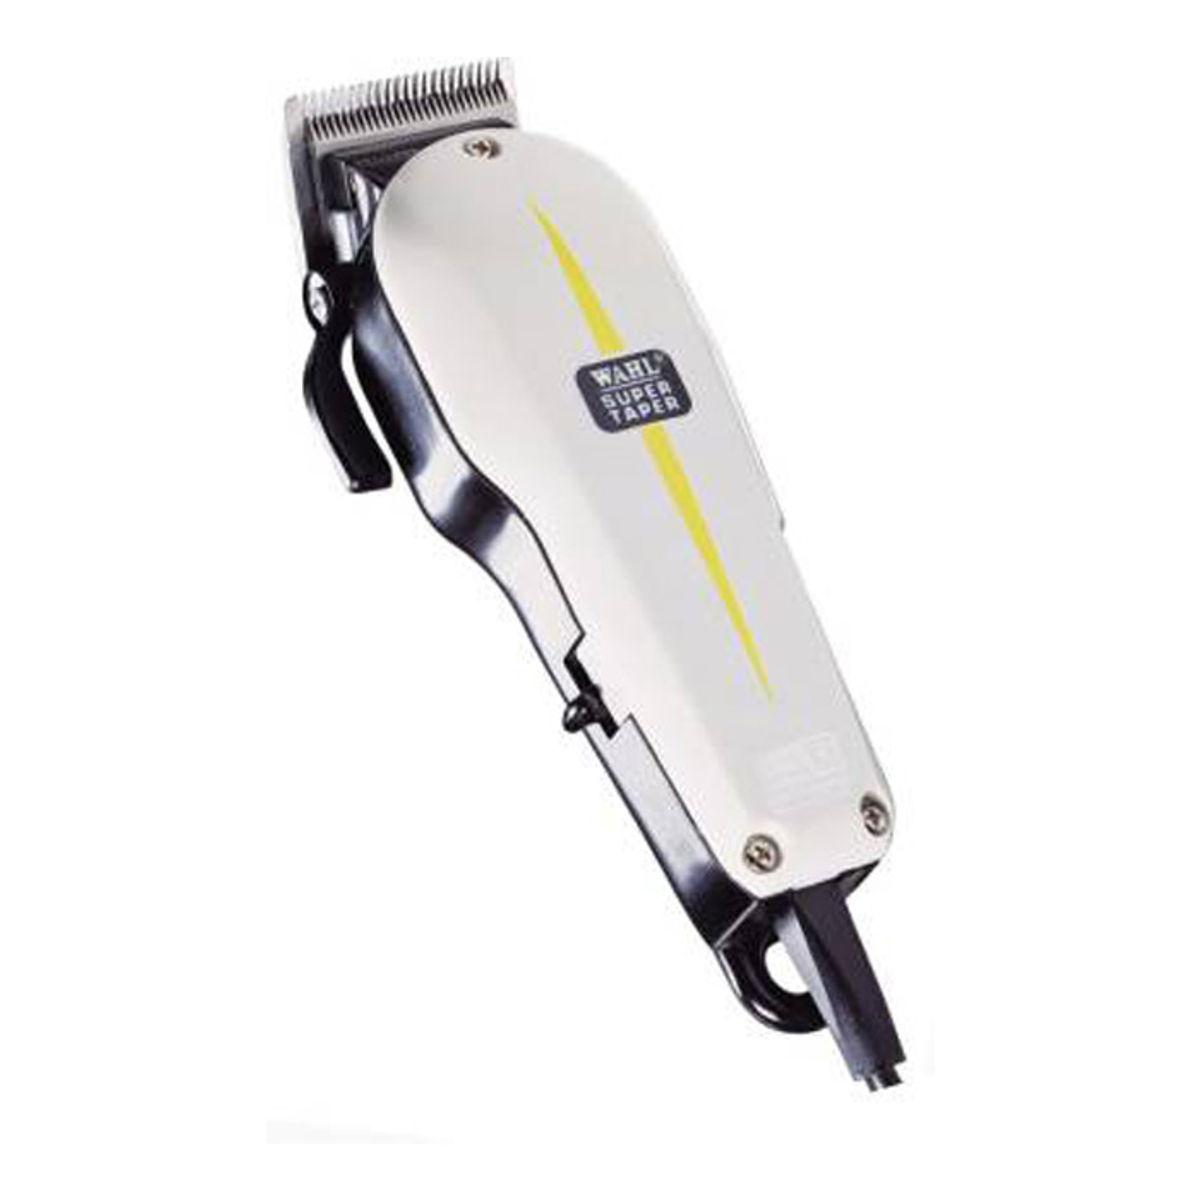 Wahl 08466-424 Hair Clipper Trimmer for Men